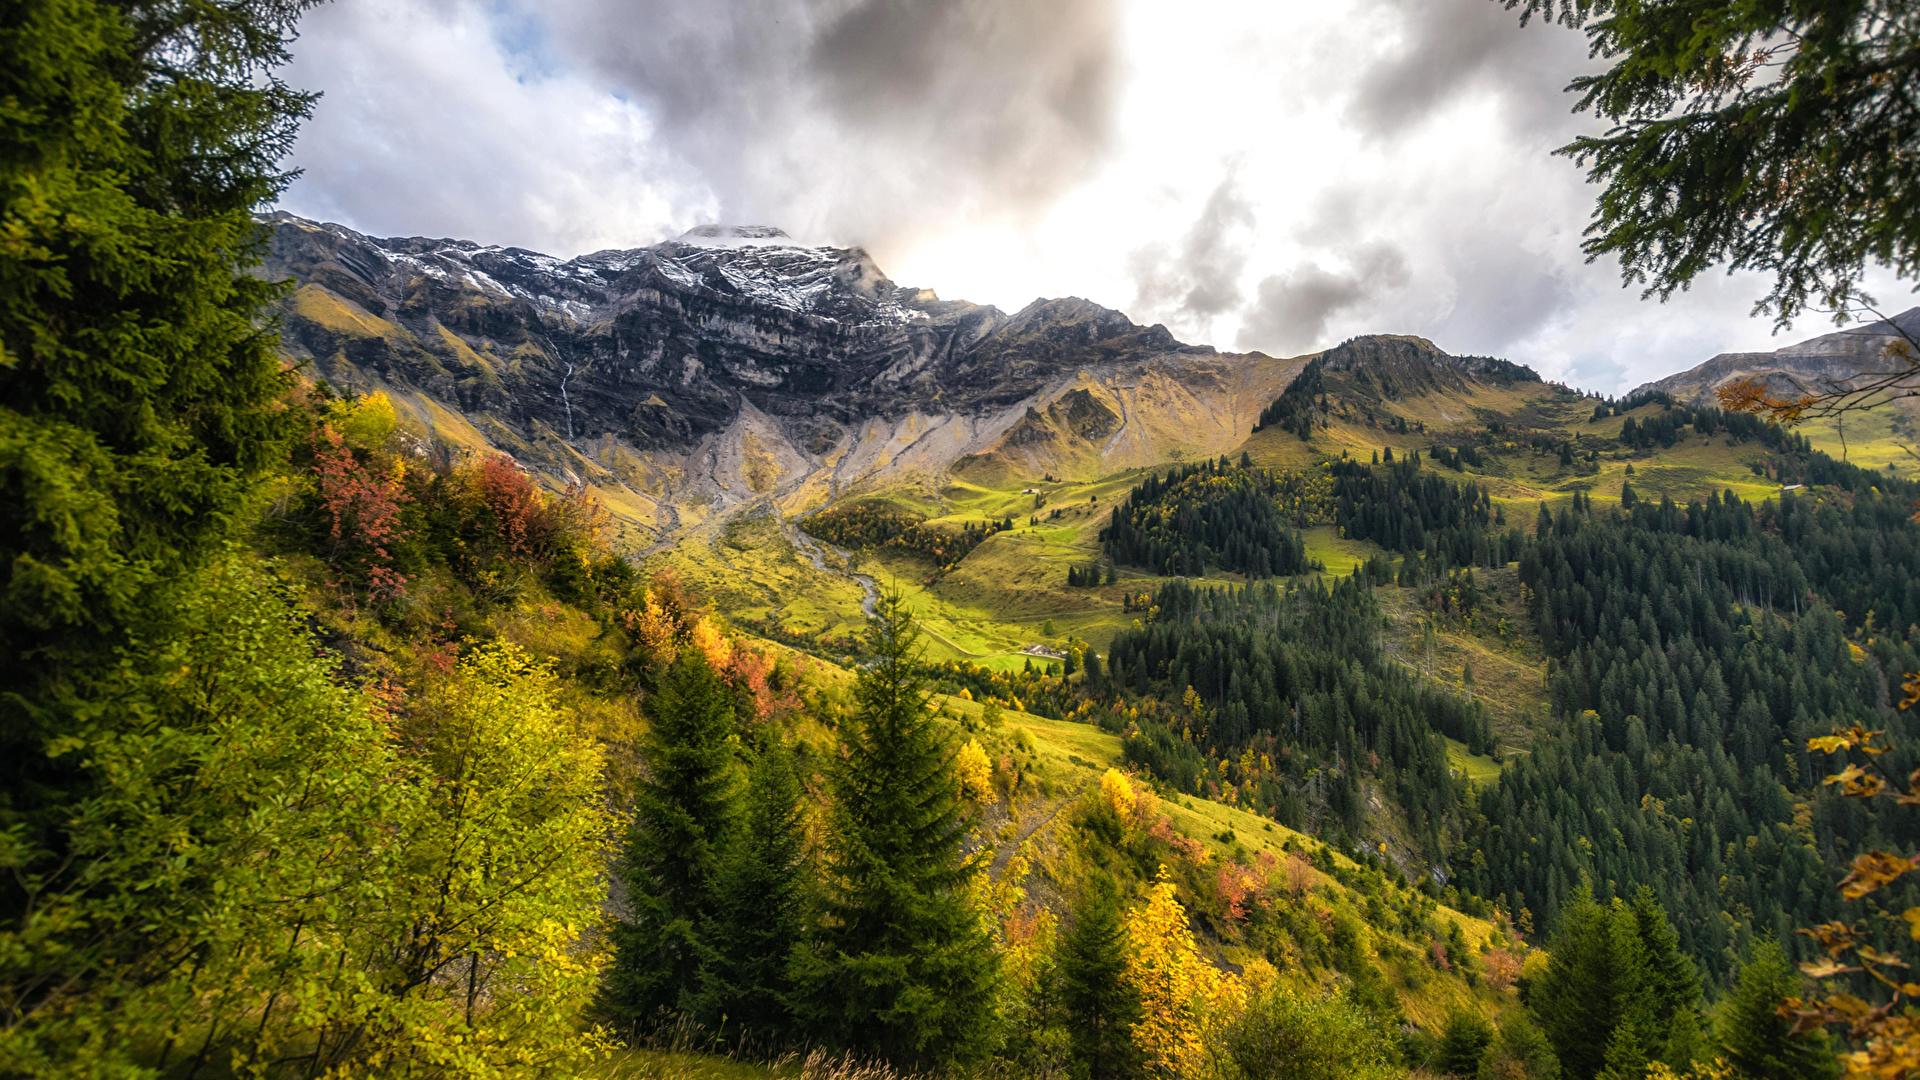 Images Switzerland Interlaken Oberhasli Nature Spruce 1920x1080 1920x1080